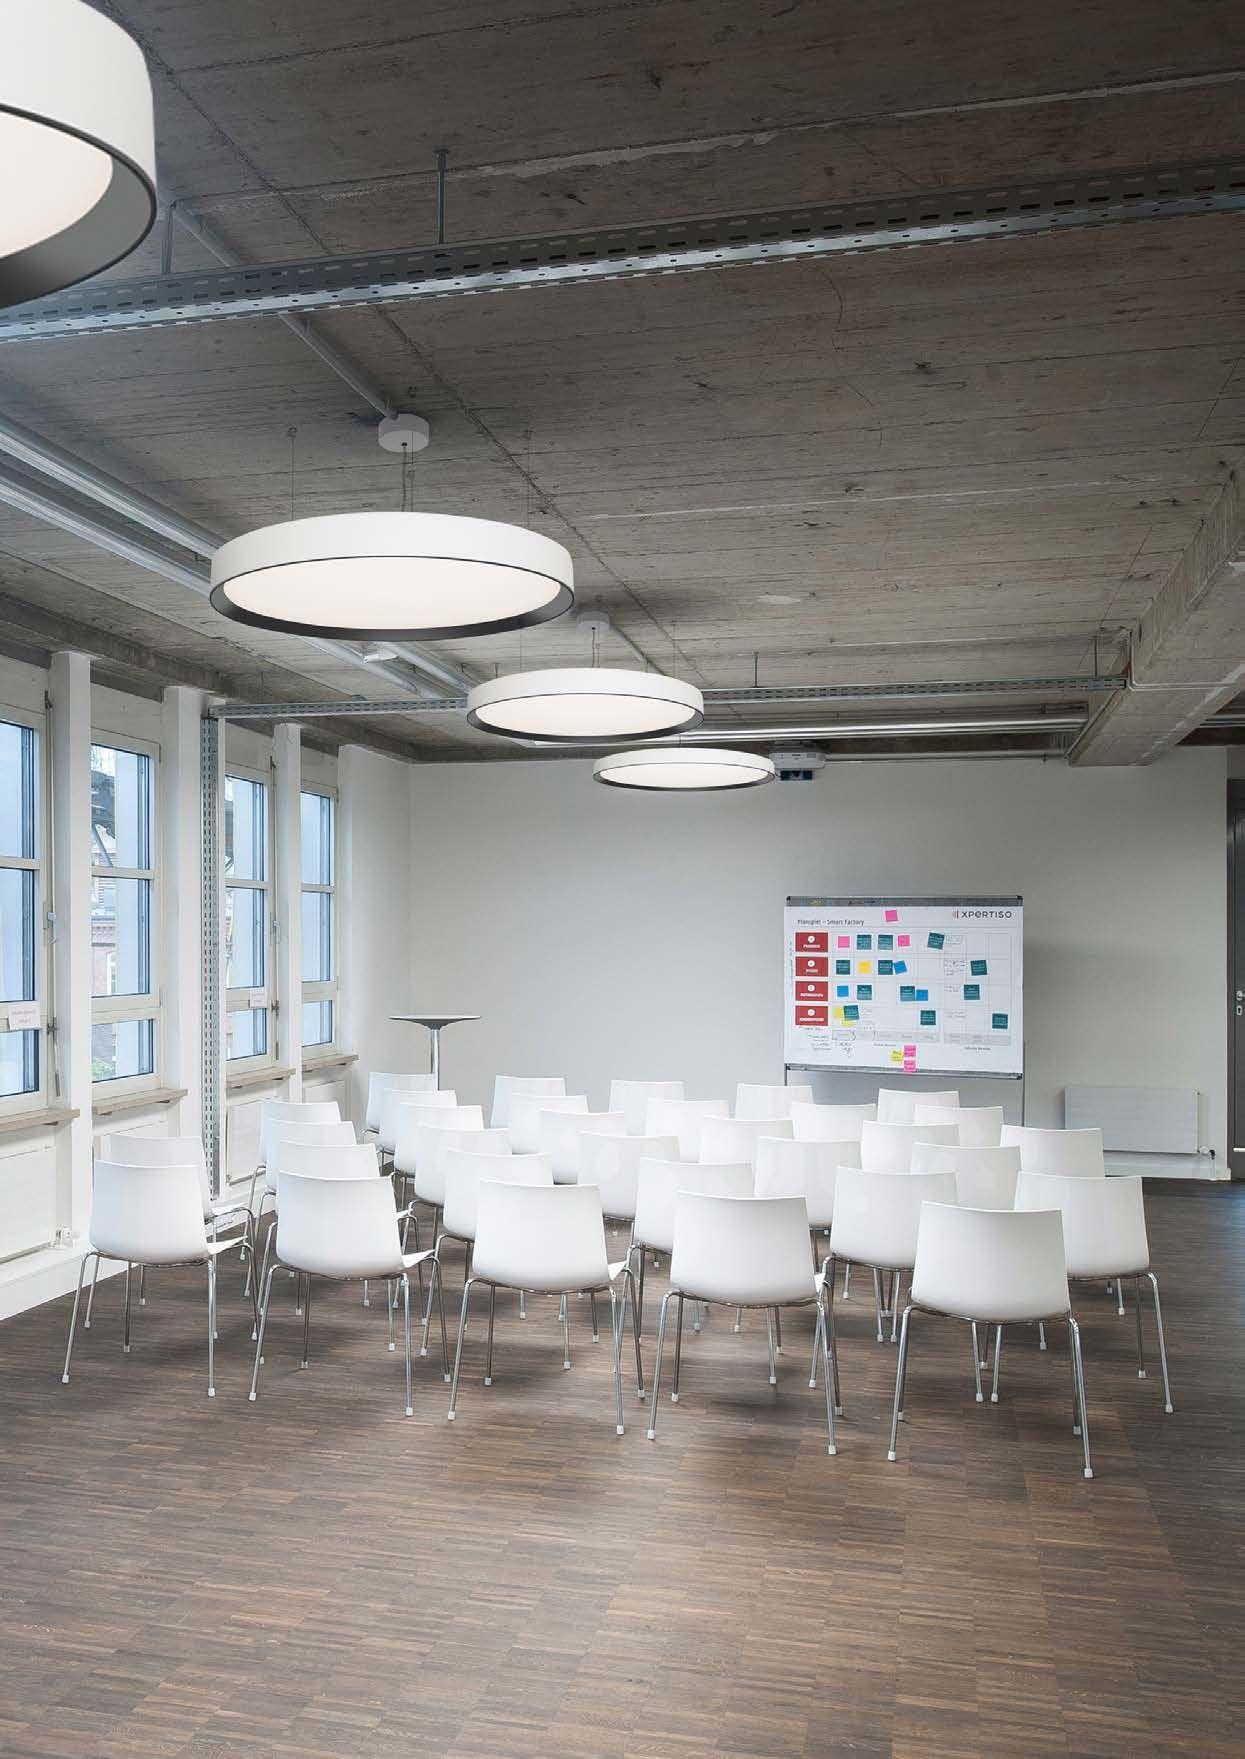 Pin By Priyantha De Alwis On Architectural Lighting Modern Office Lighting Light Architecture